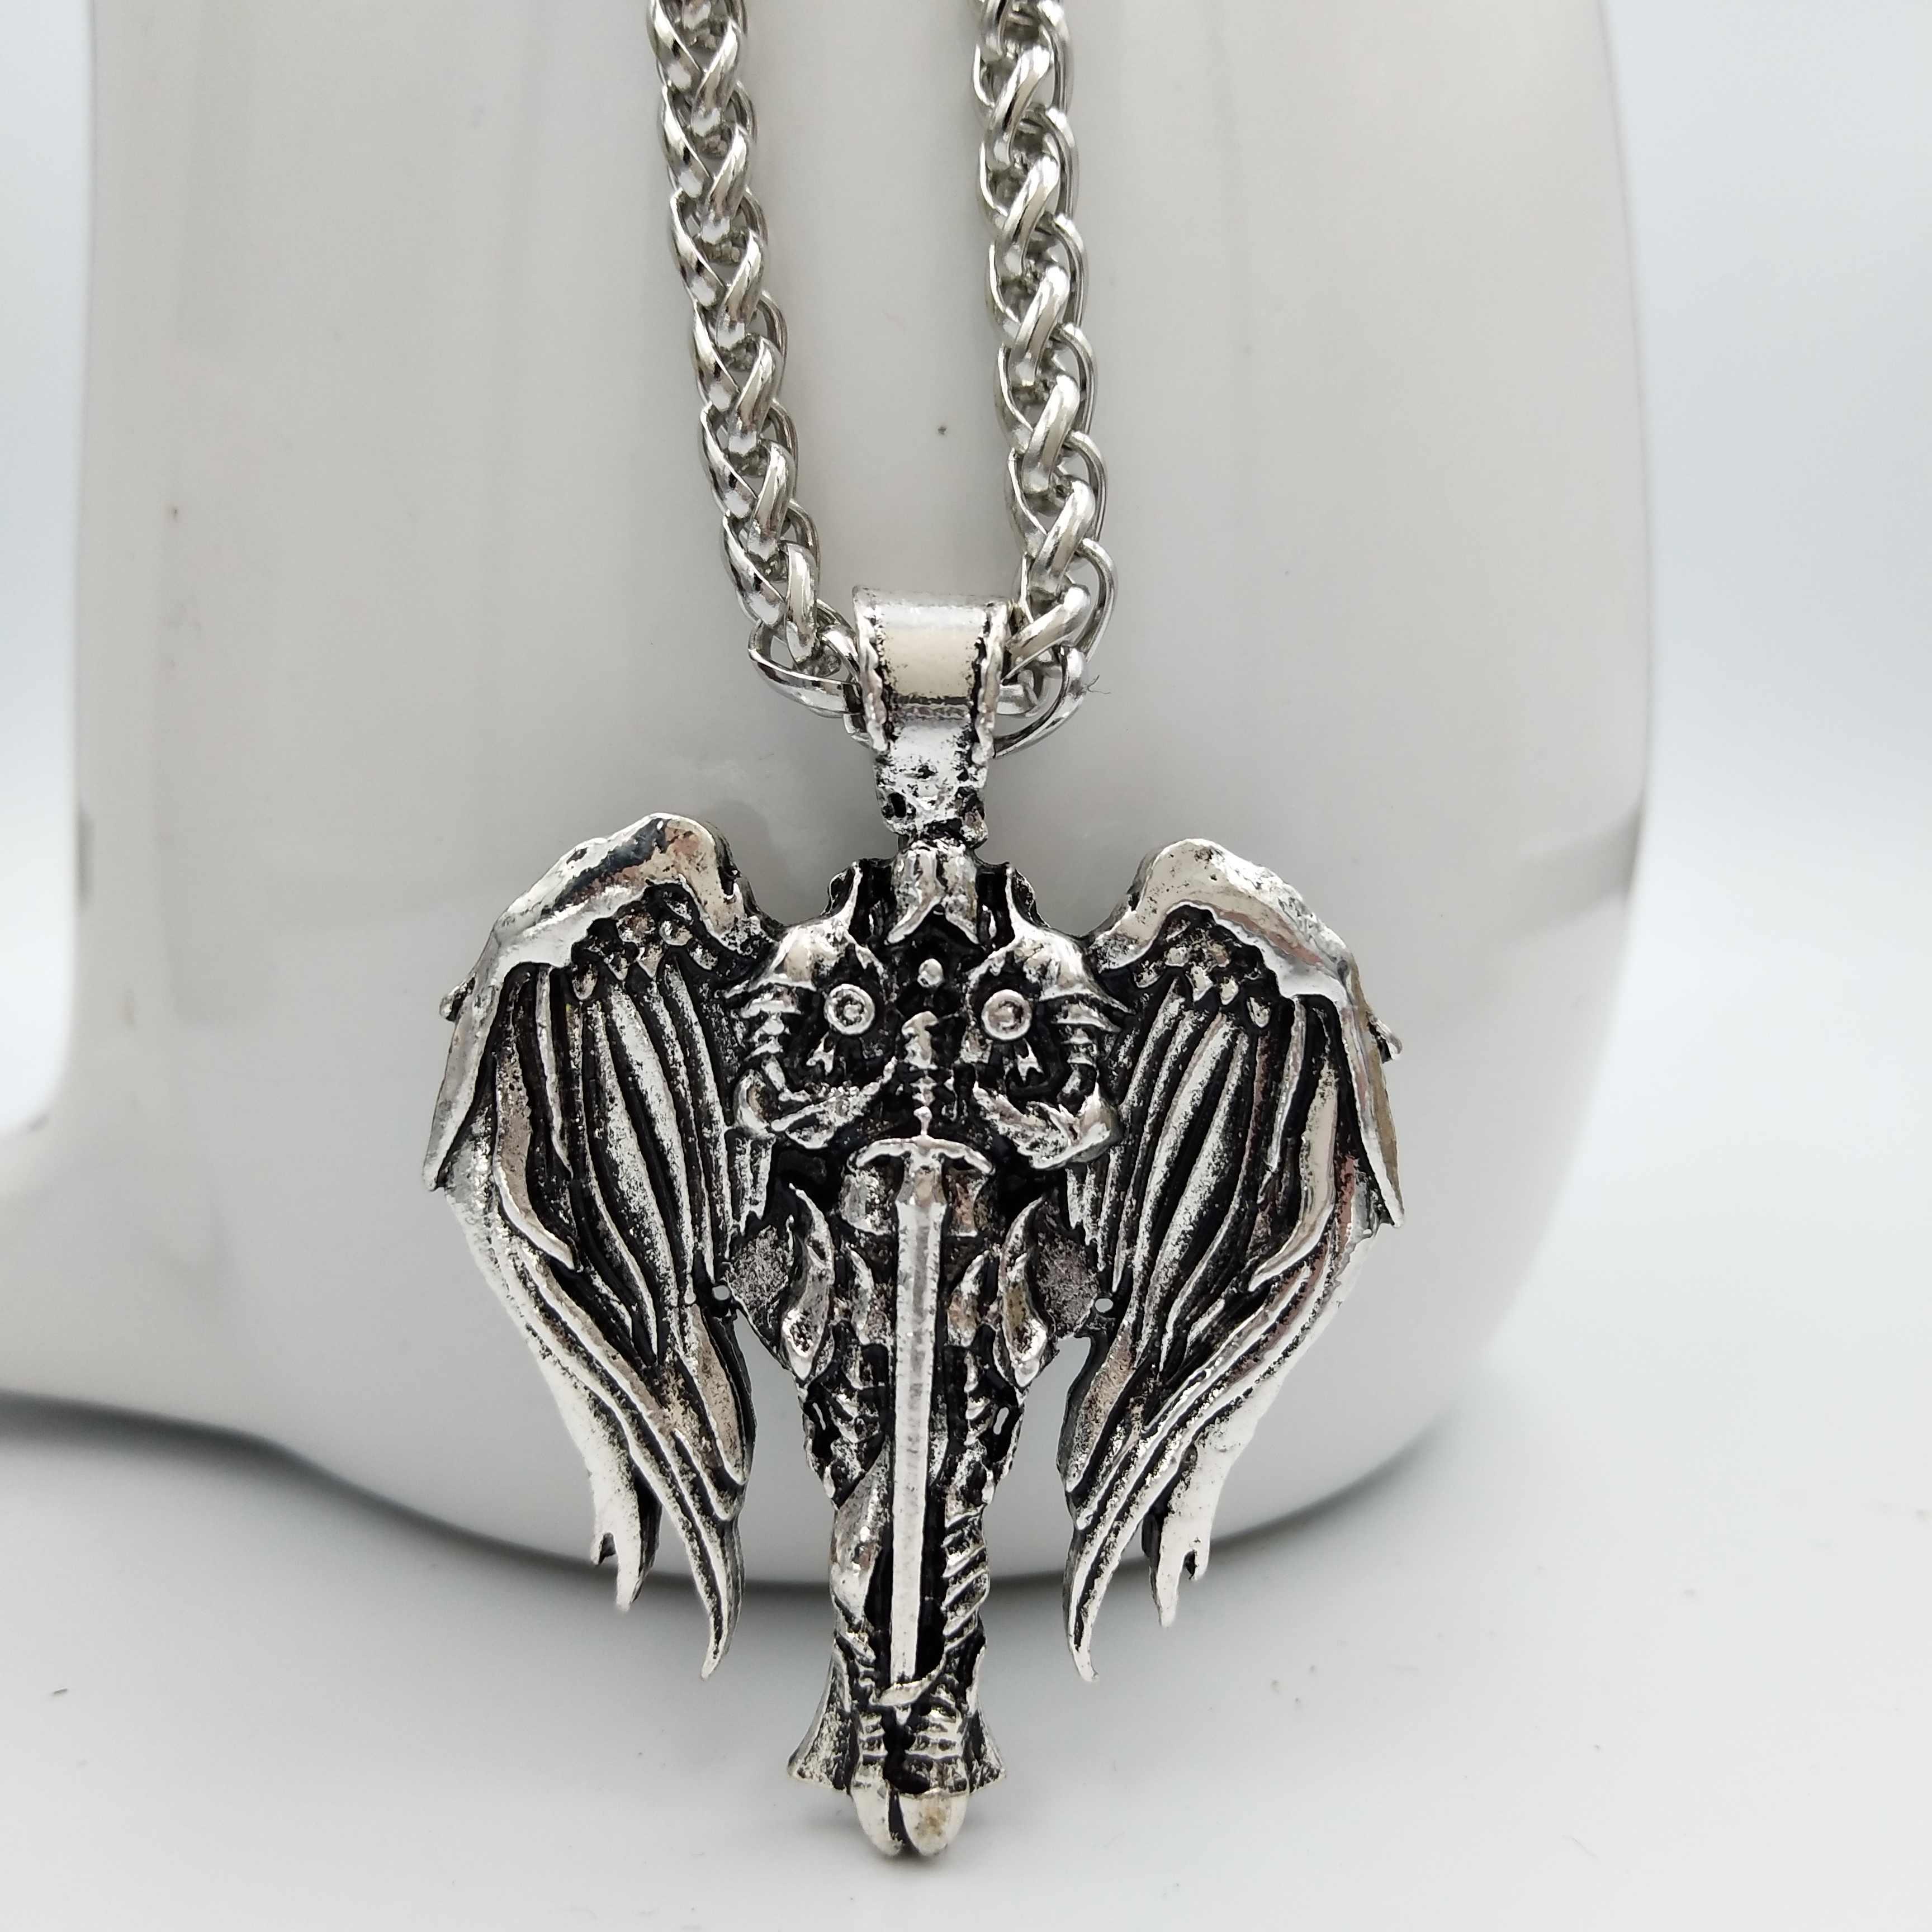 dropshipping Diablo Archangel Protection Irish Cross Pendant Angel Wings  Necklace Wicca Pagan Talisman Viking Jewelry